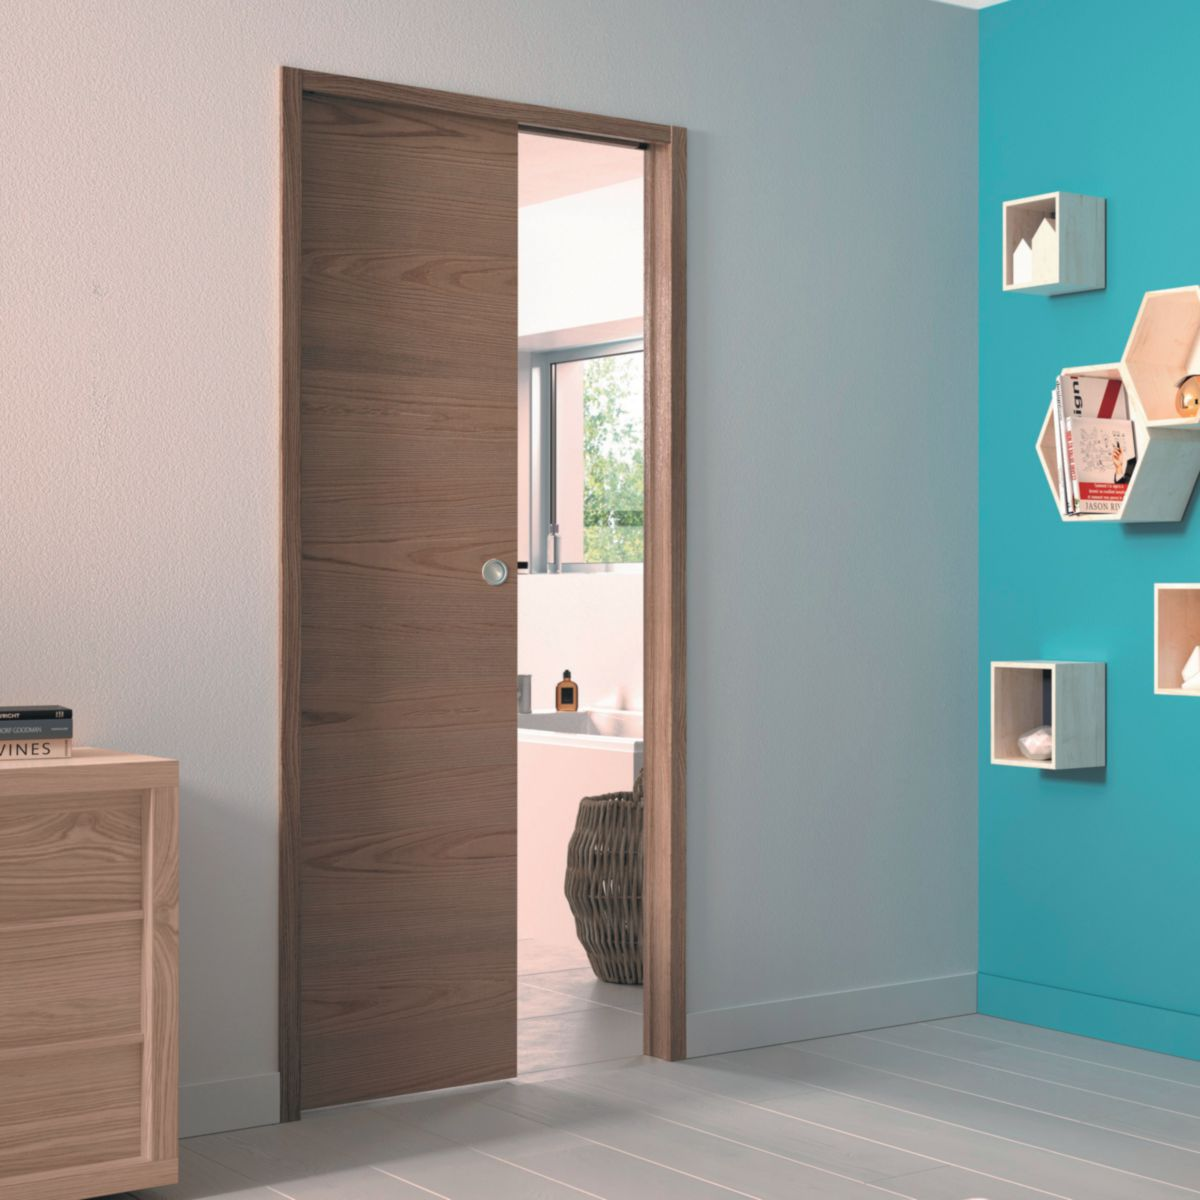 sogal bloc porte me alv olaire 204 x 93 r versible. Black Bedroom Furniture Sets. Home Design Ideas